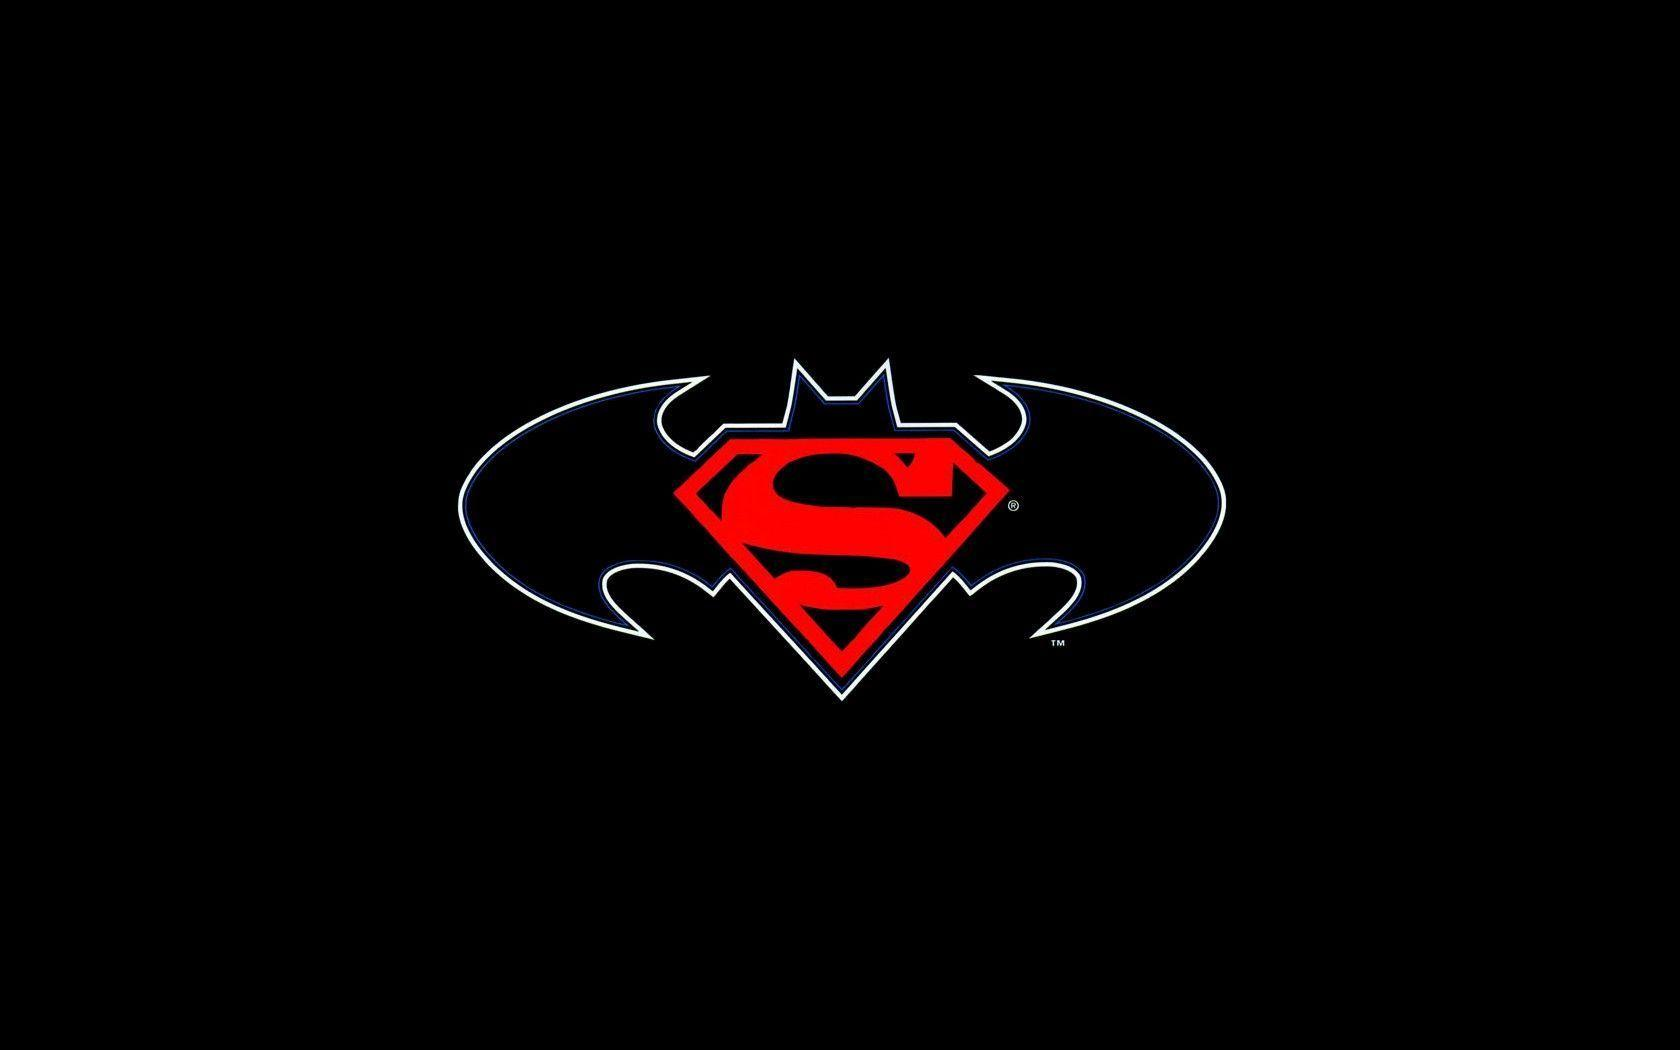 Superman Logo Wallpapers - Wallpaper Cave